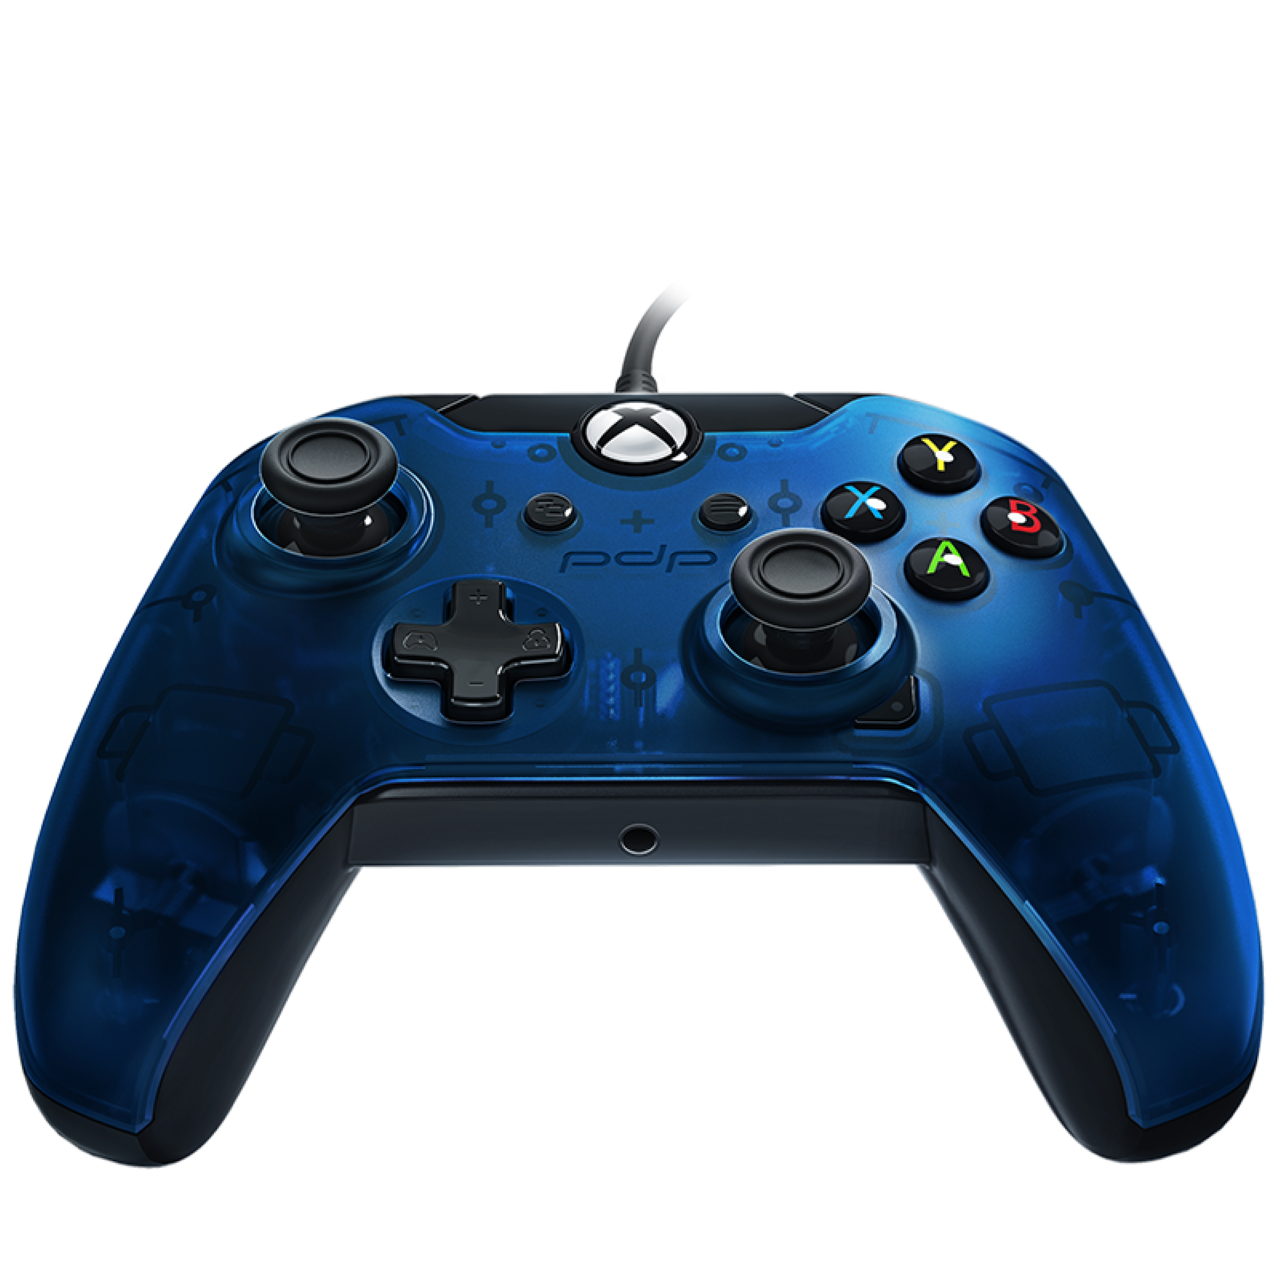 Microsoft Xbox ONE,PC Wired Controller PDP XO Blue (провідний)